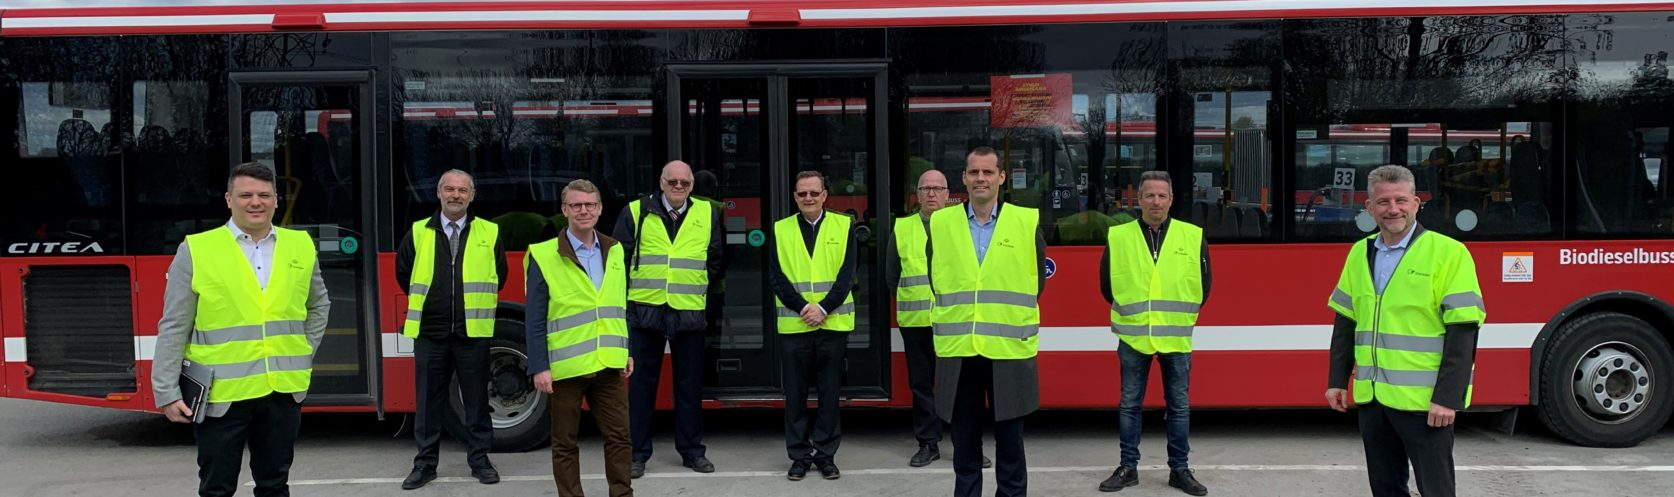 bus-transdev-bus-sweden-marsta